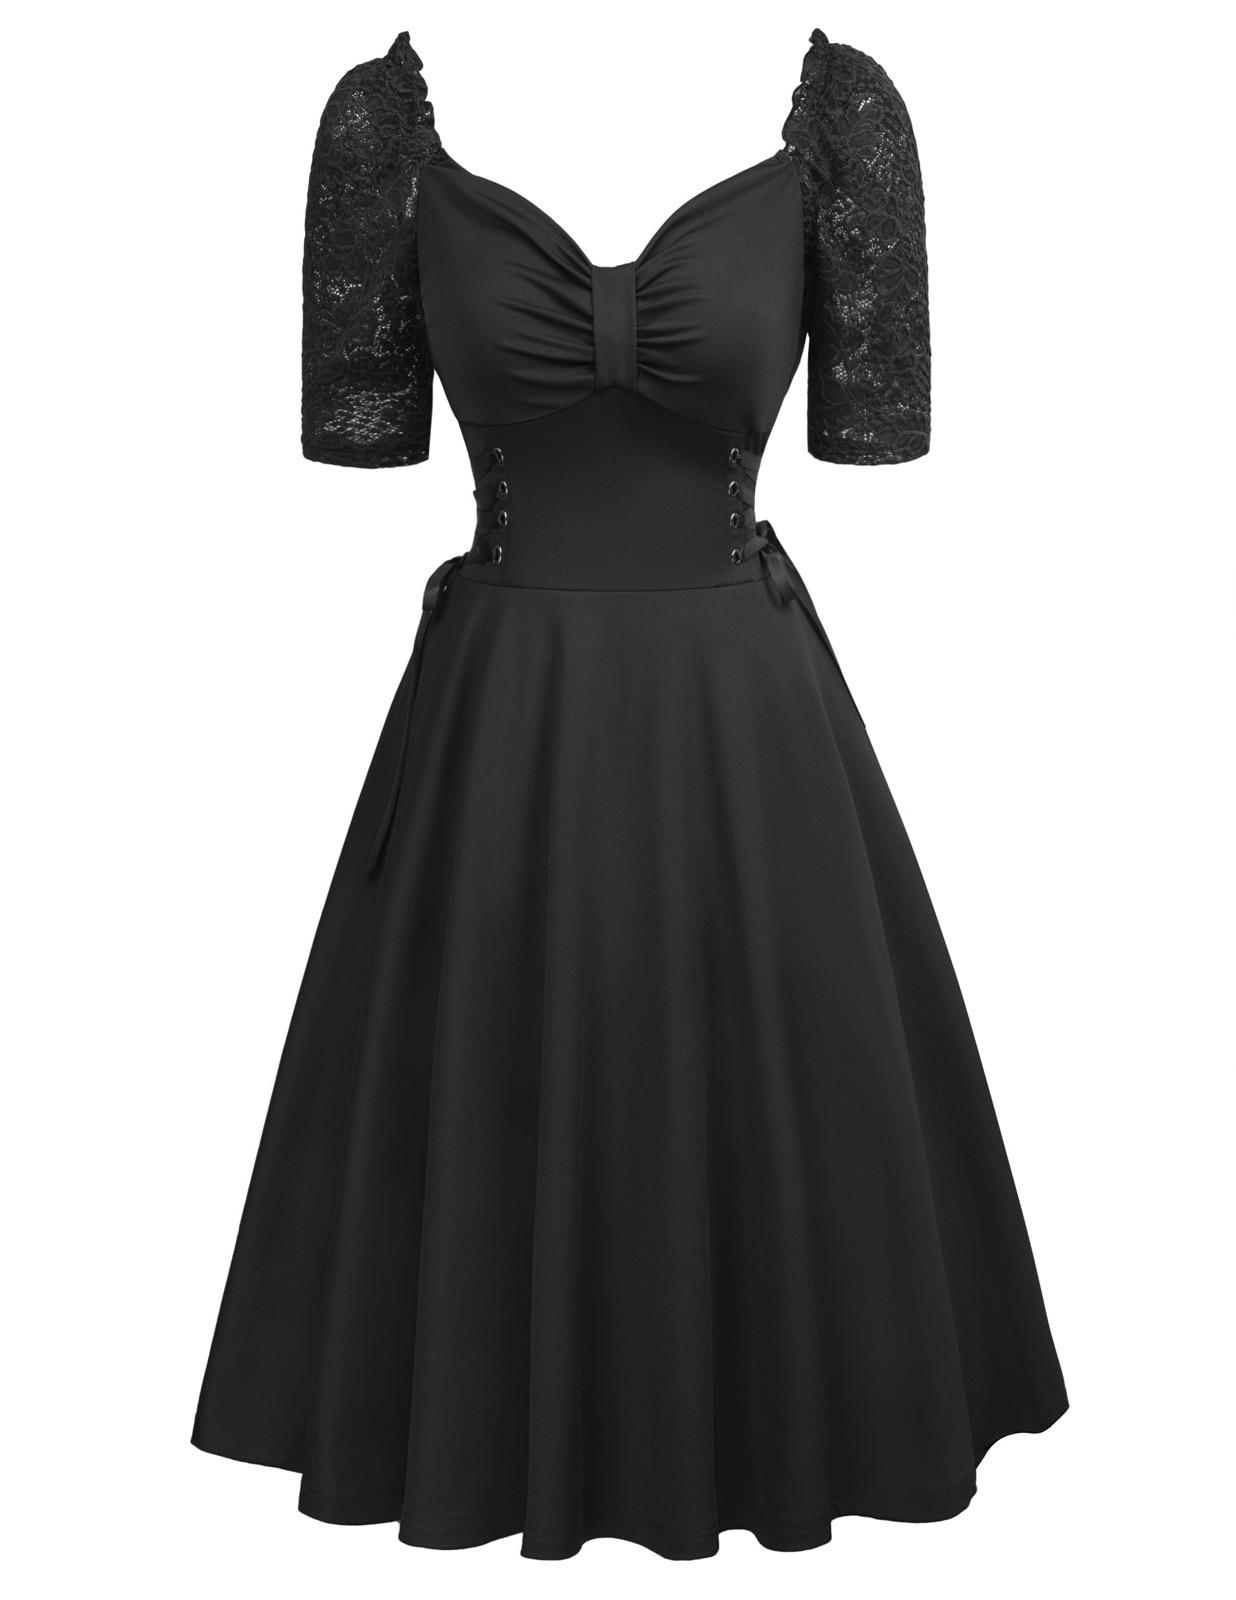 dress women summer Retro Vintage Women Solid Color lace half Sleeve V-Neck A-Line evening Party Dress vestidos de festa 2018